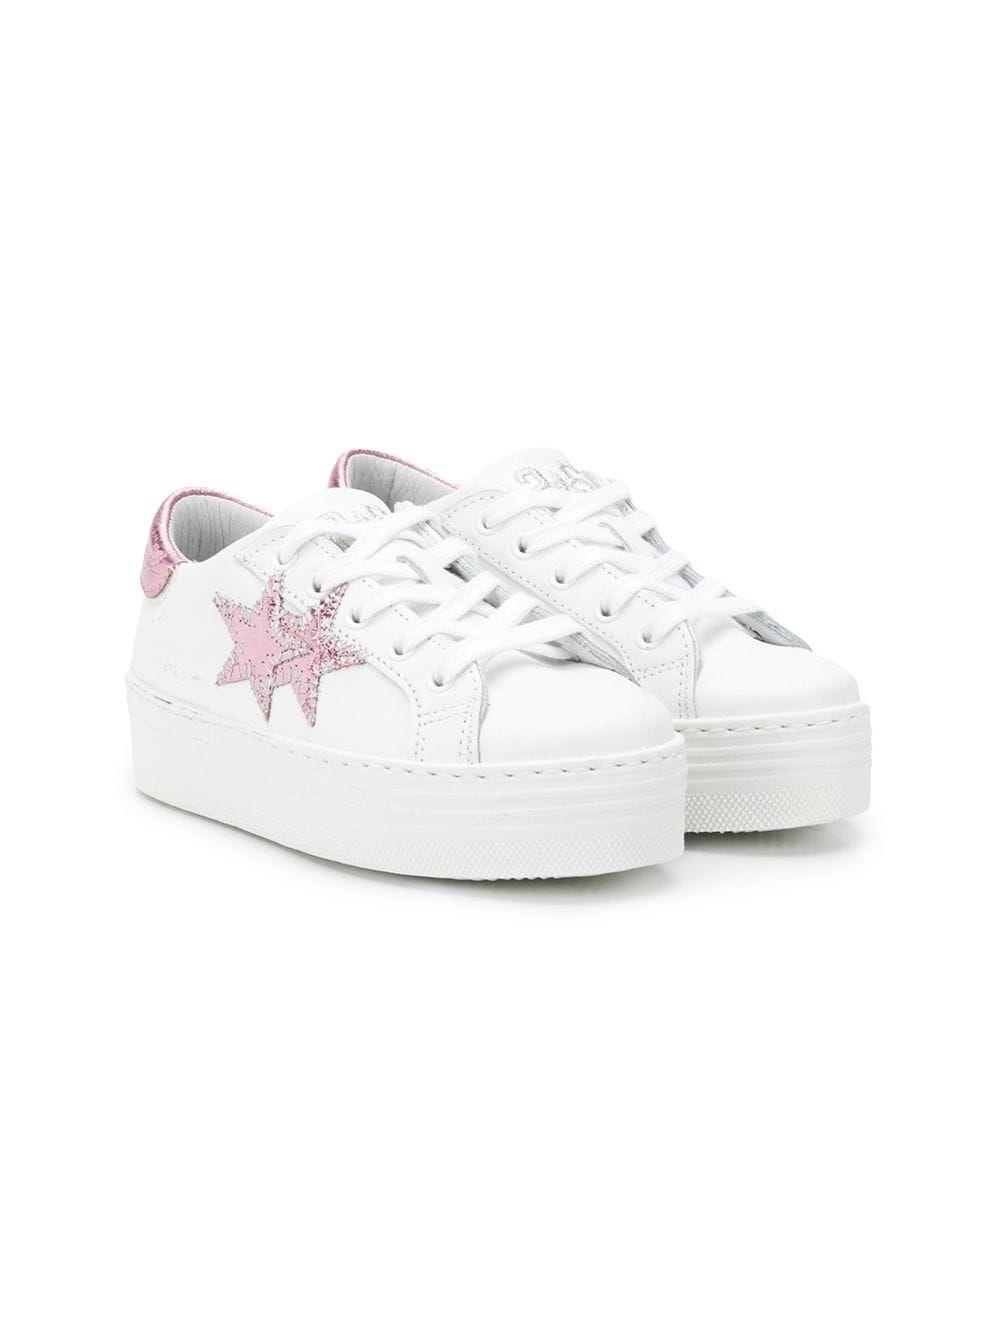 Star Patch Platform Sneakers - Farfetch